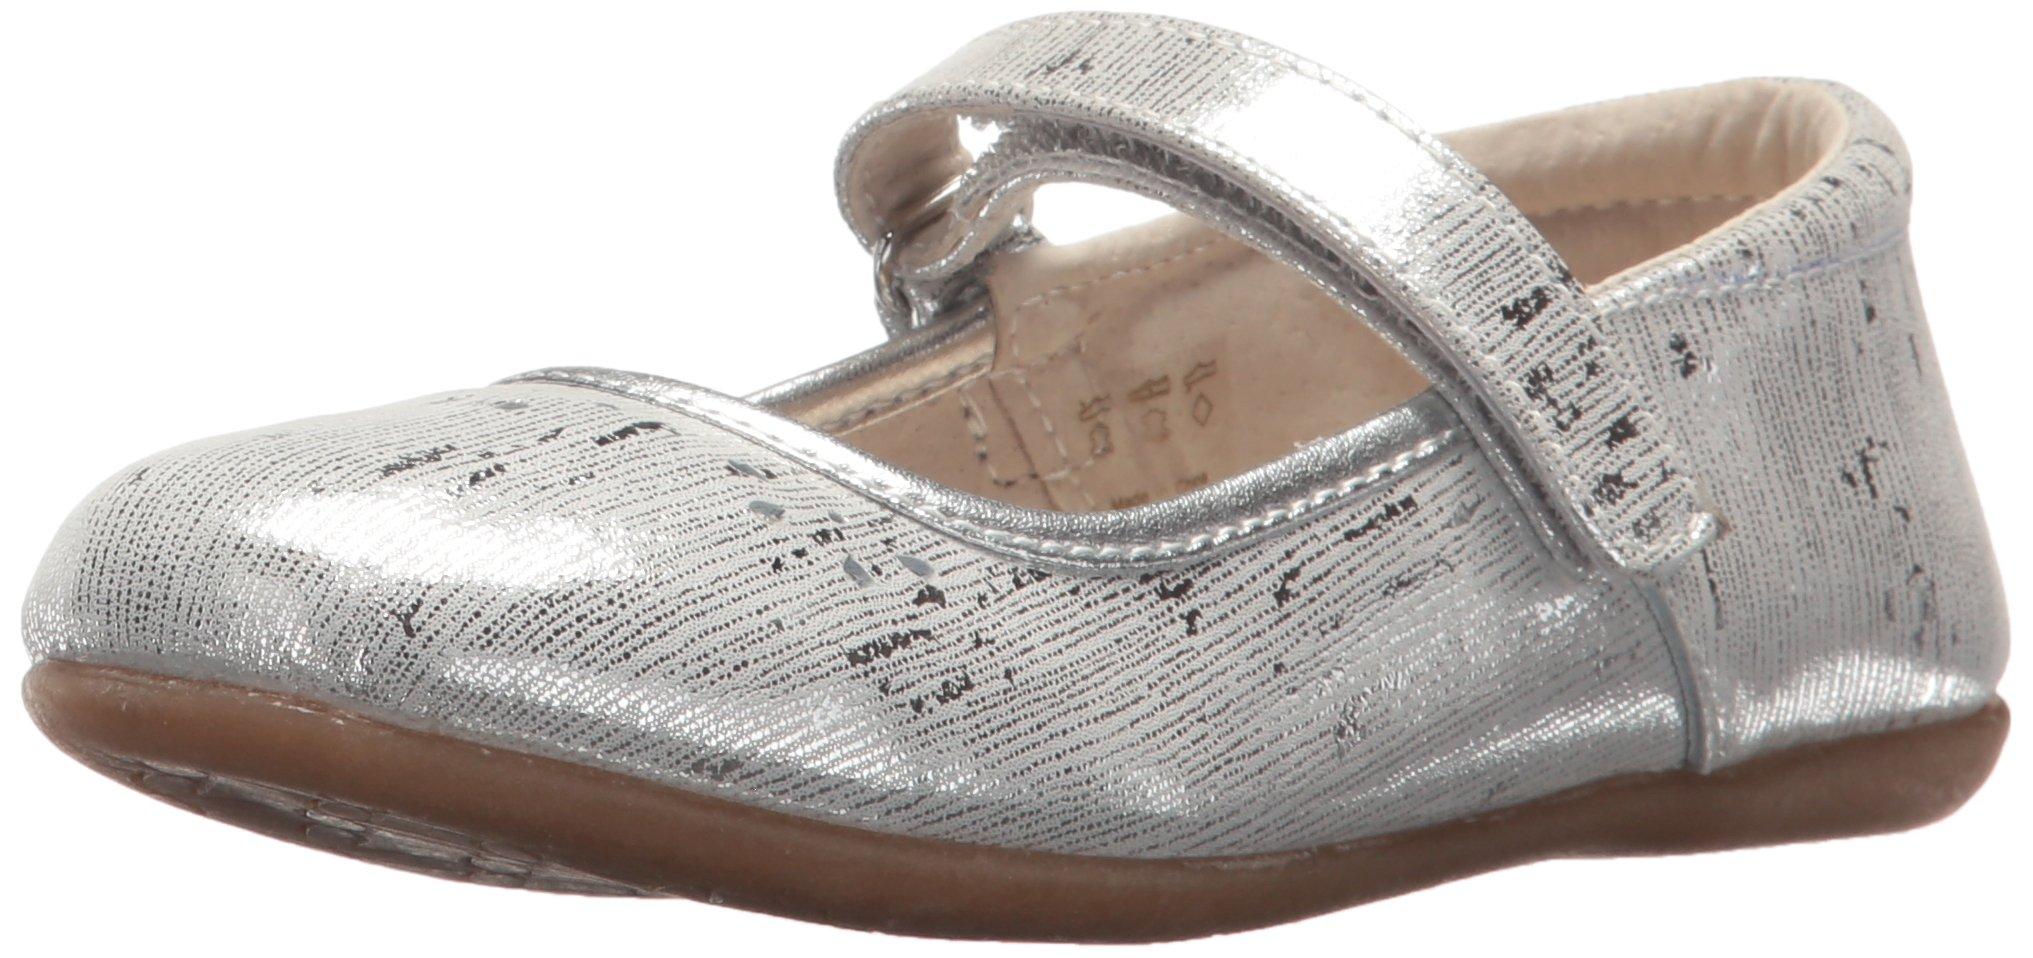 See Kai Run Girls' Ginger III Ballet Flat, Silver, 12.5 M US Little Kid